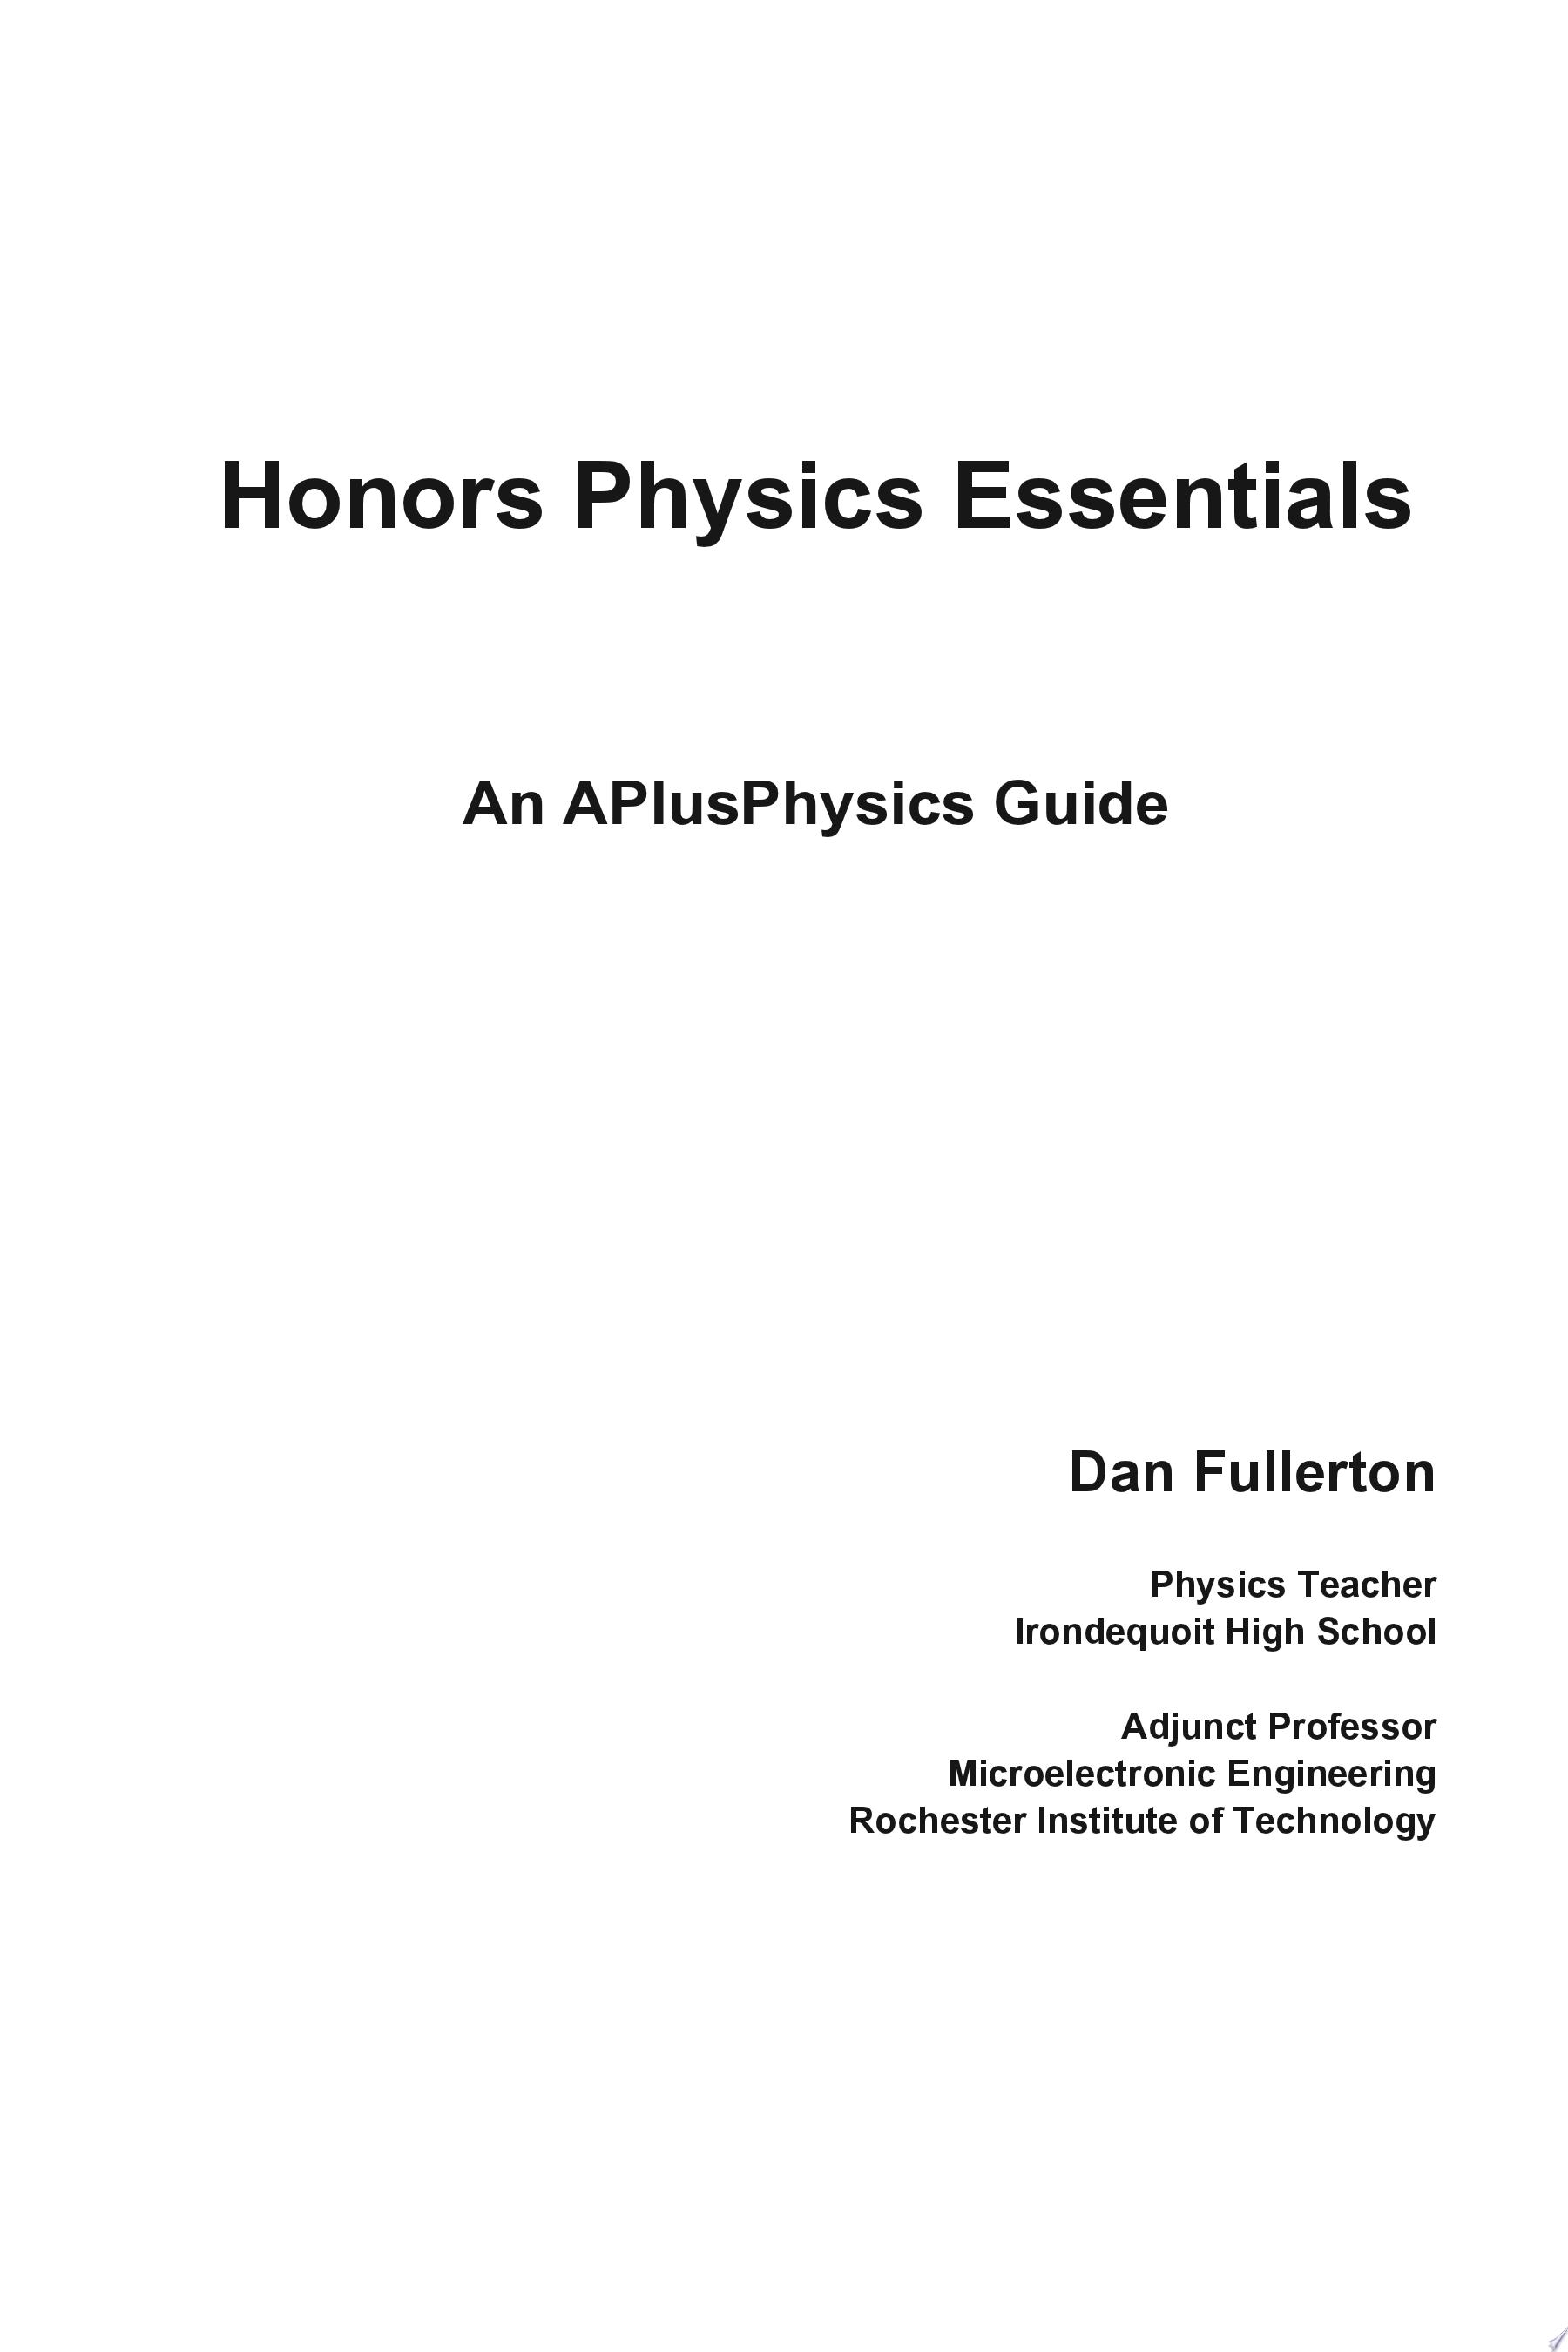 Honors Physics Essentials